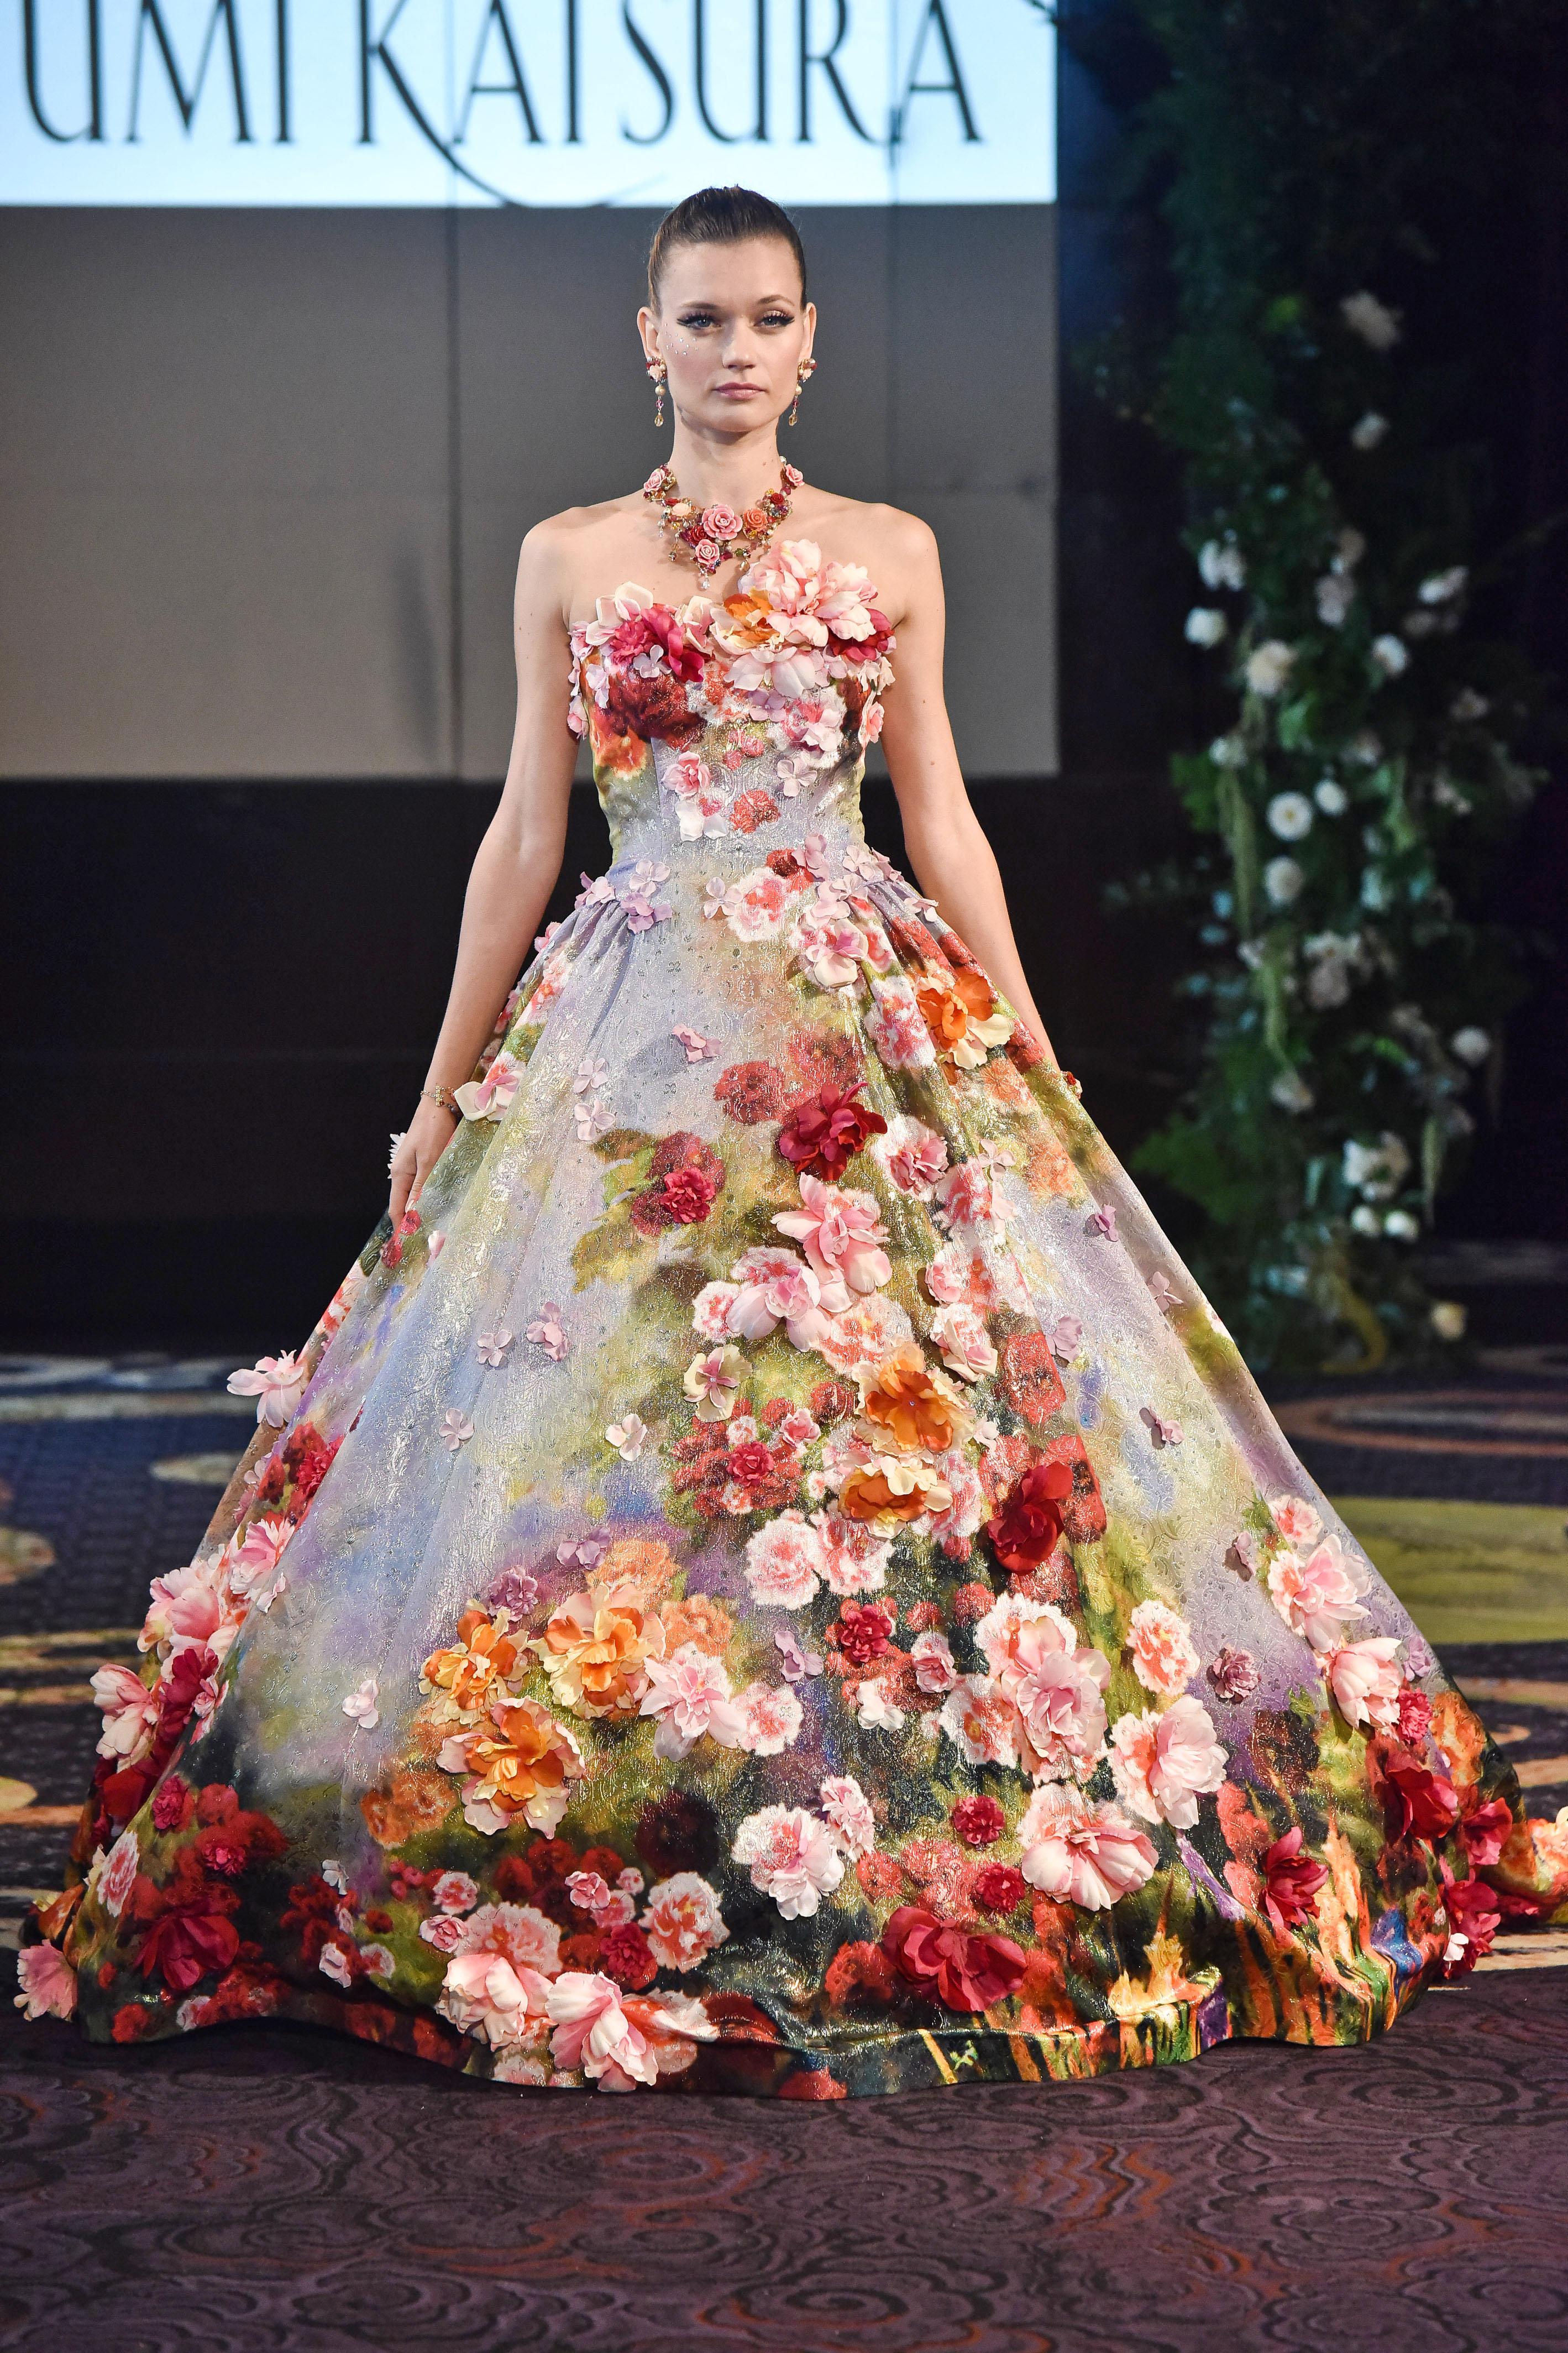 yumi katsura floral a-line ball gown wedding dress fall 2018